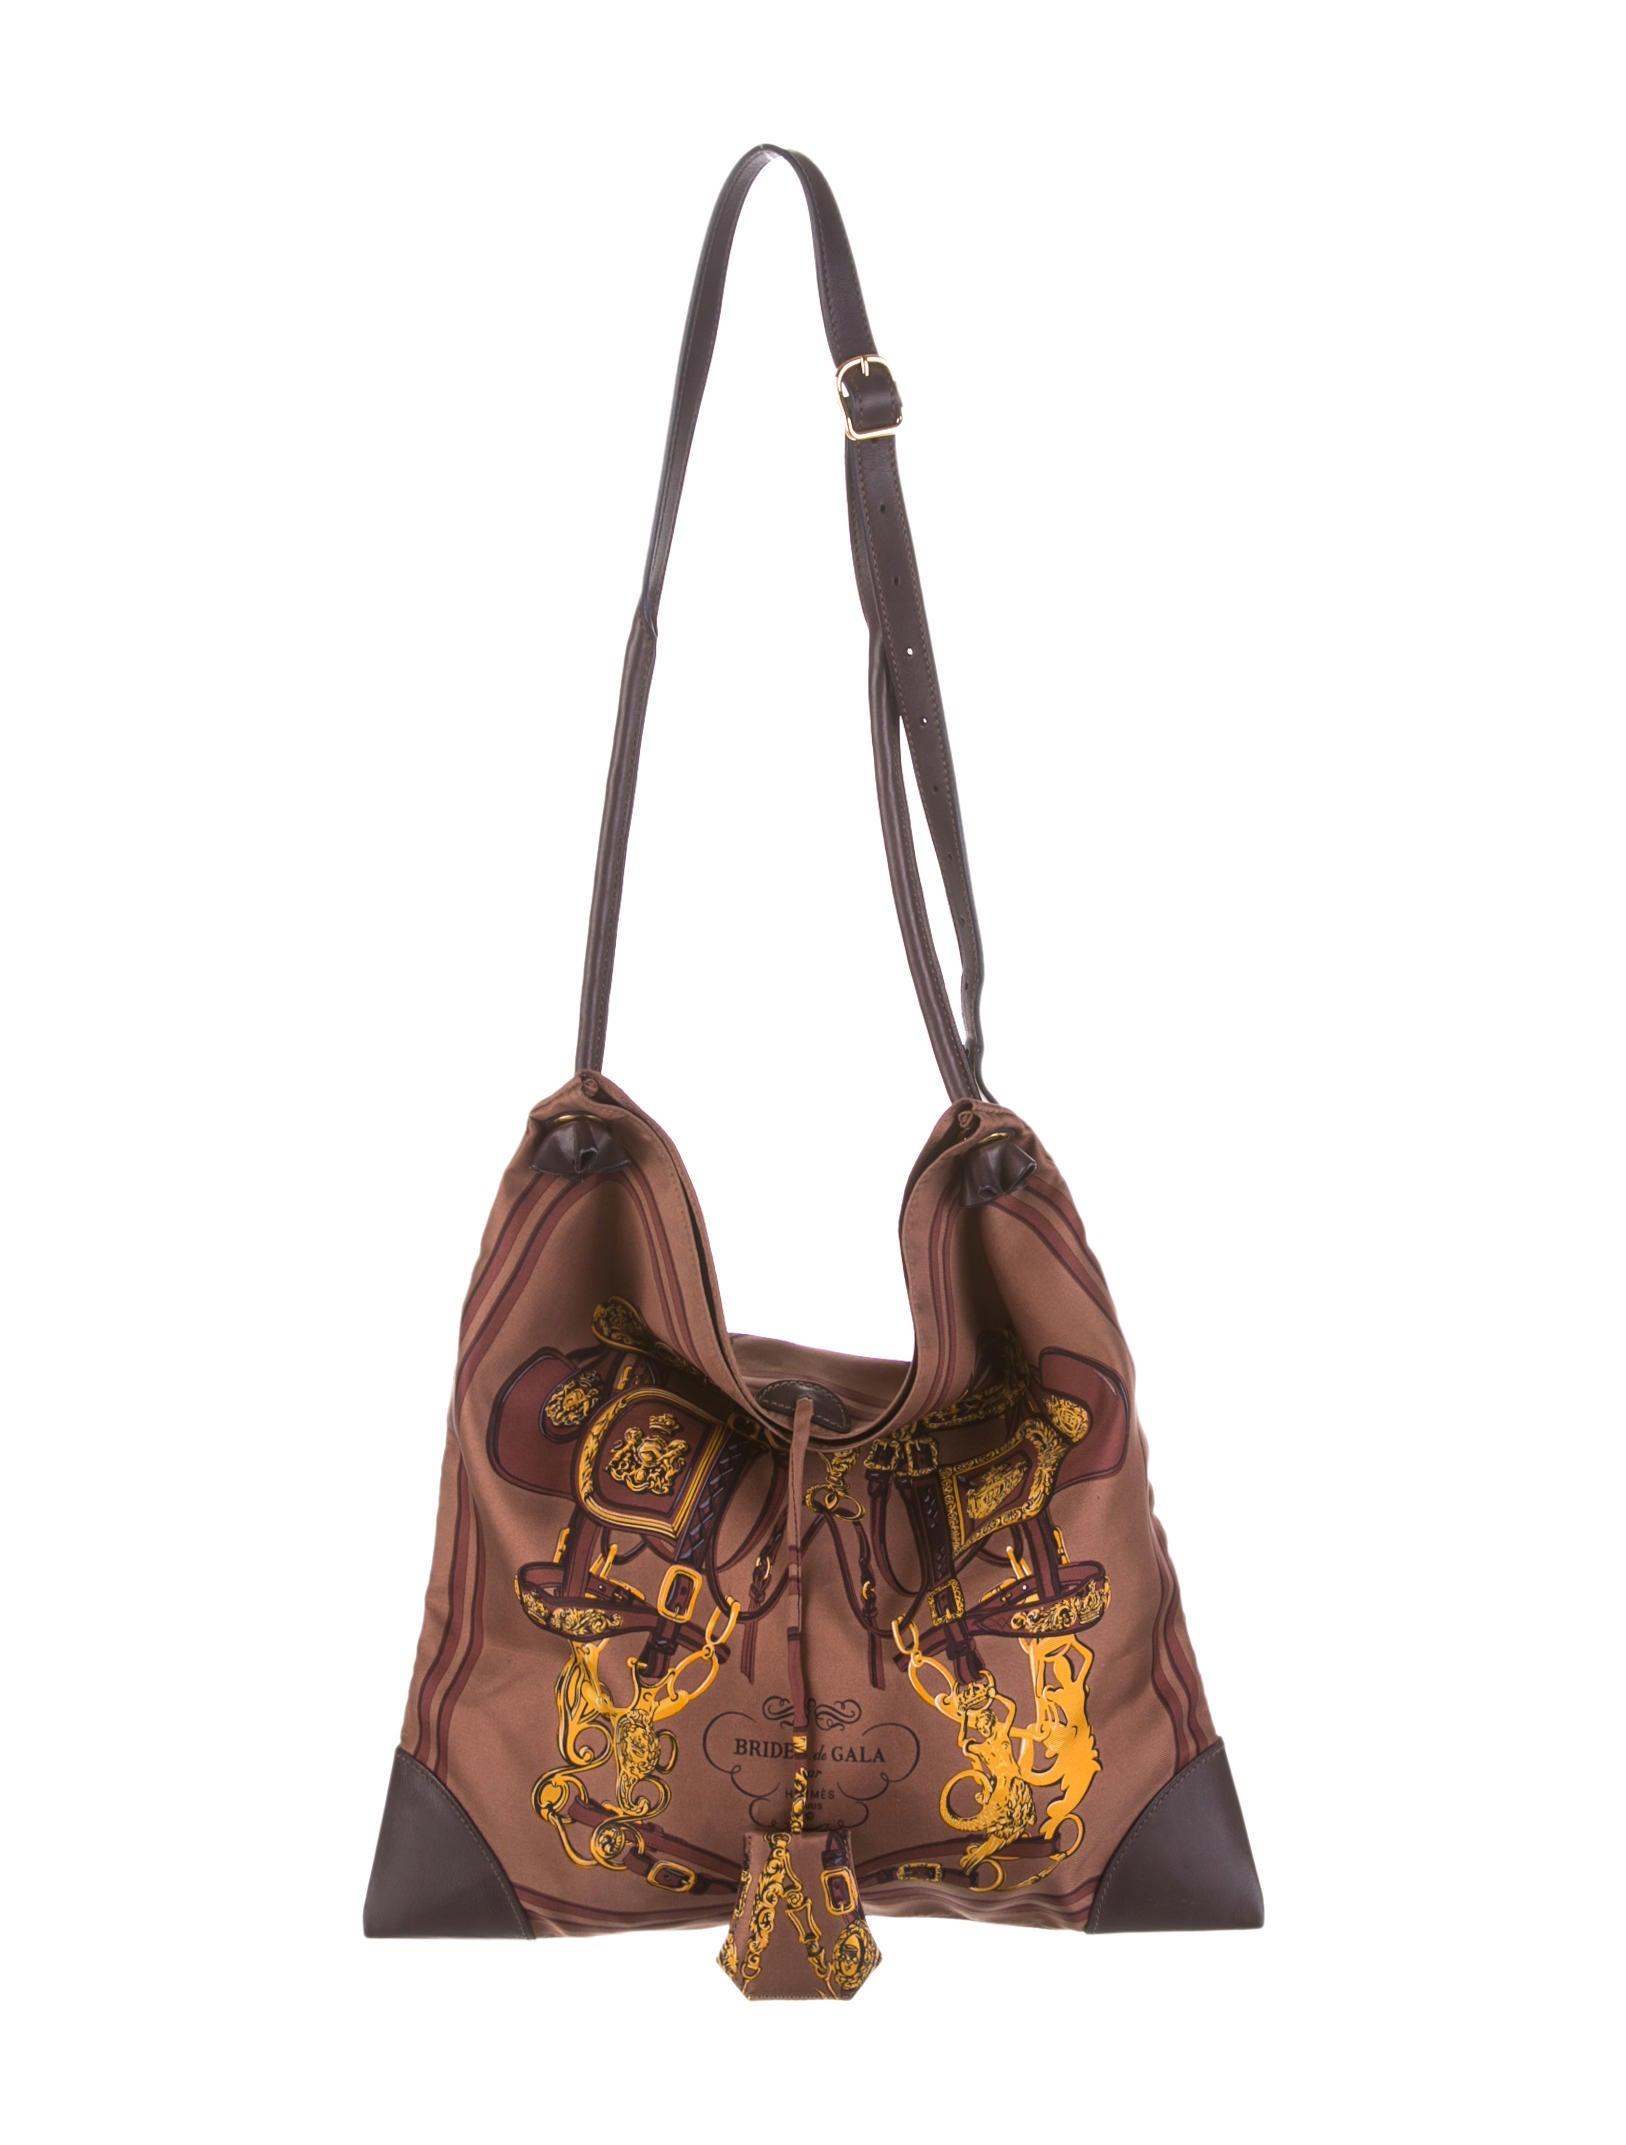 2ac98d389dd4 Hermès Silky City Bag - Handbags - HER31453